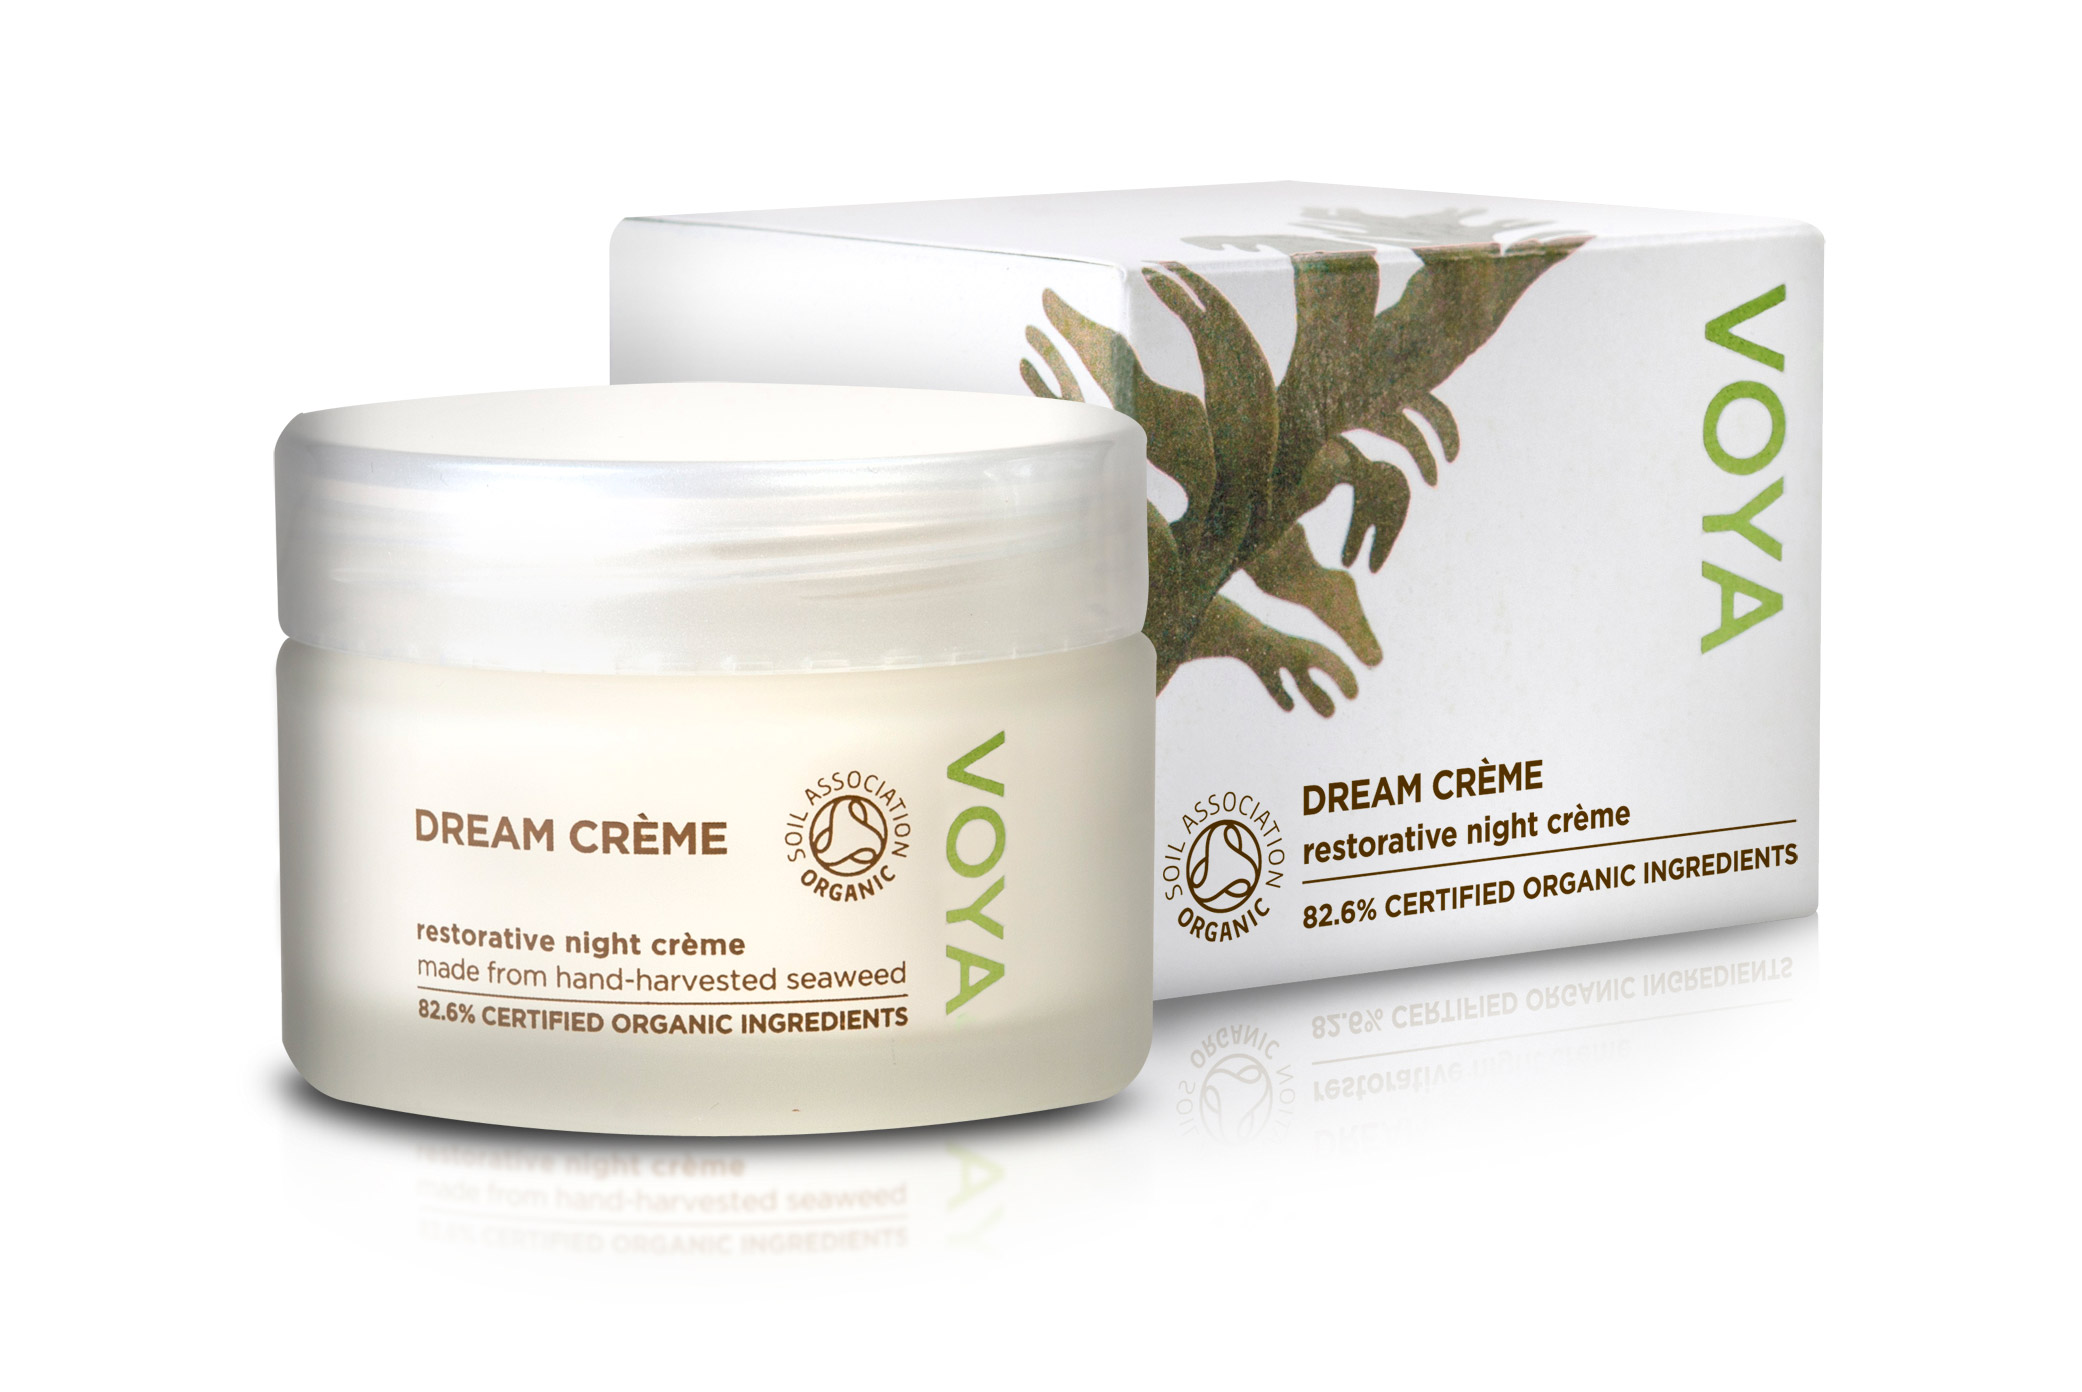 VOYA Dream Crème